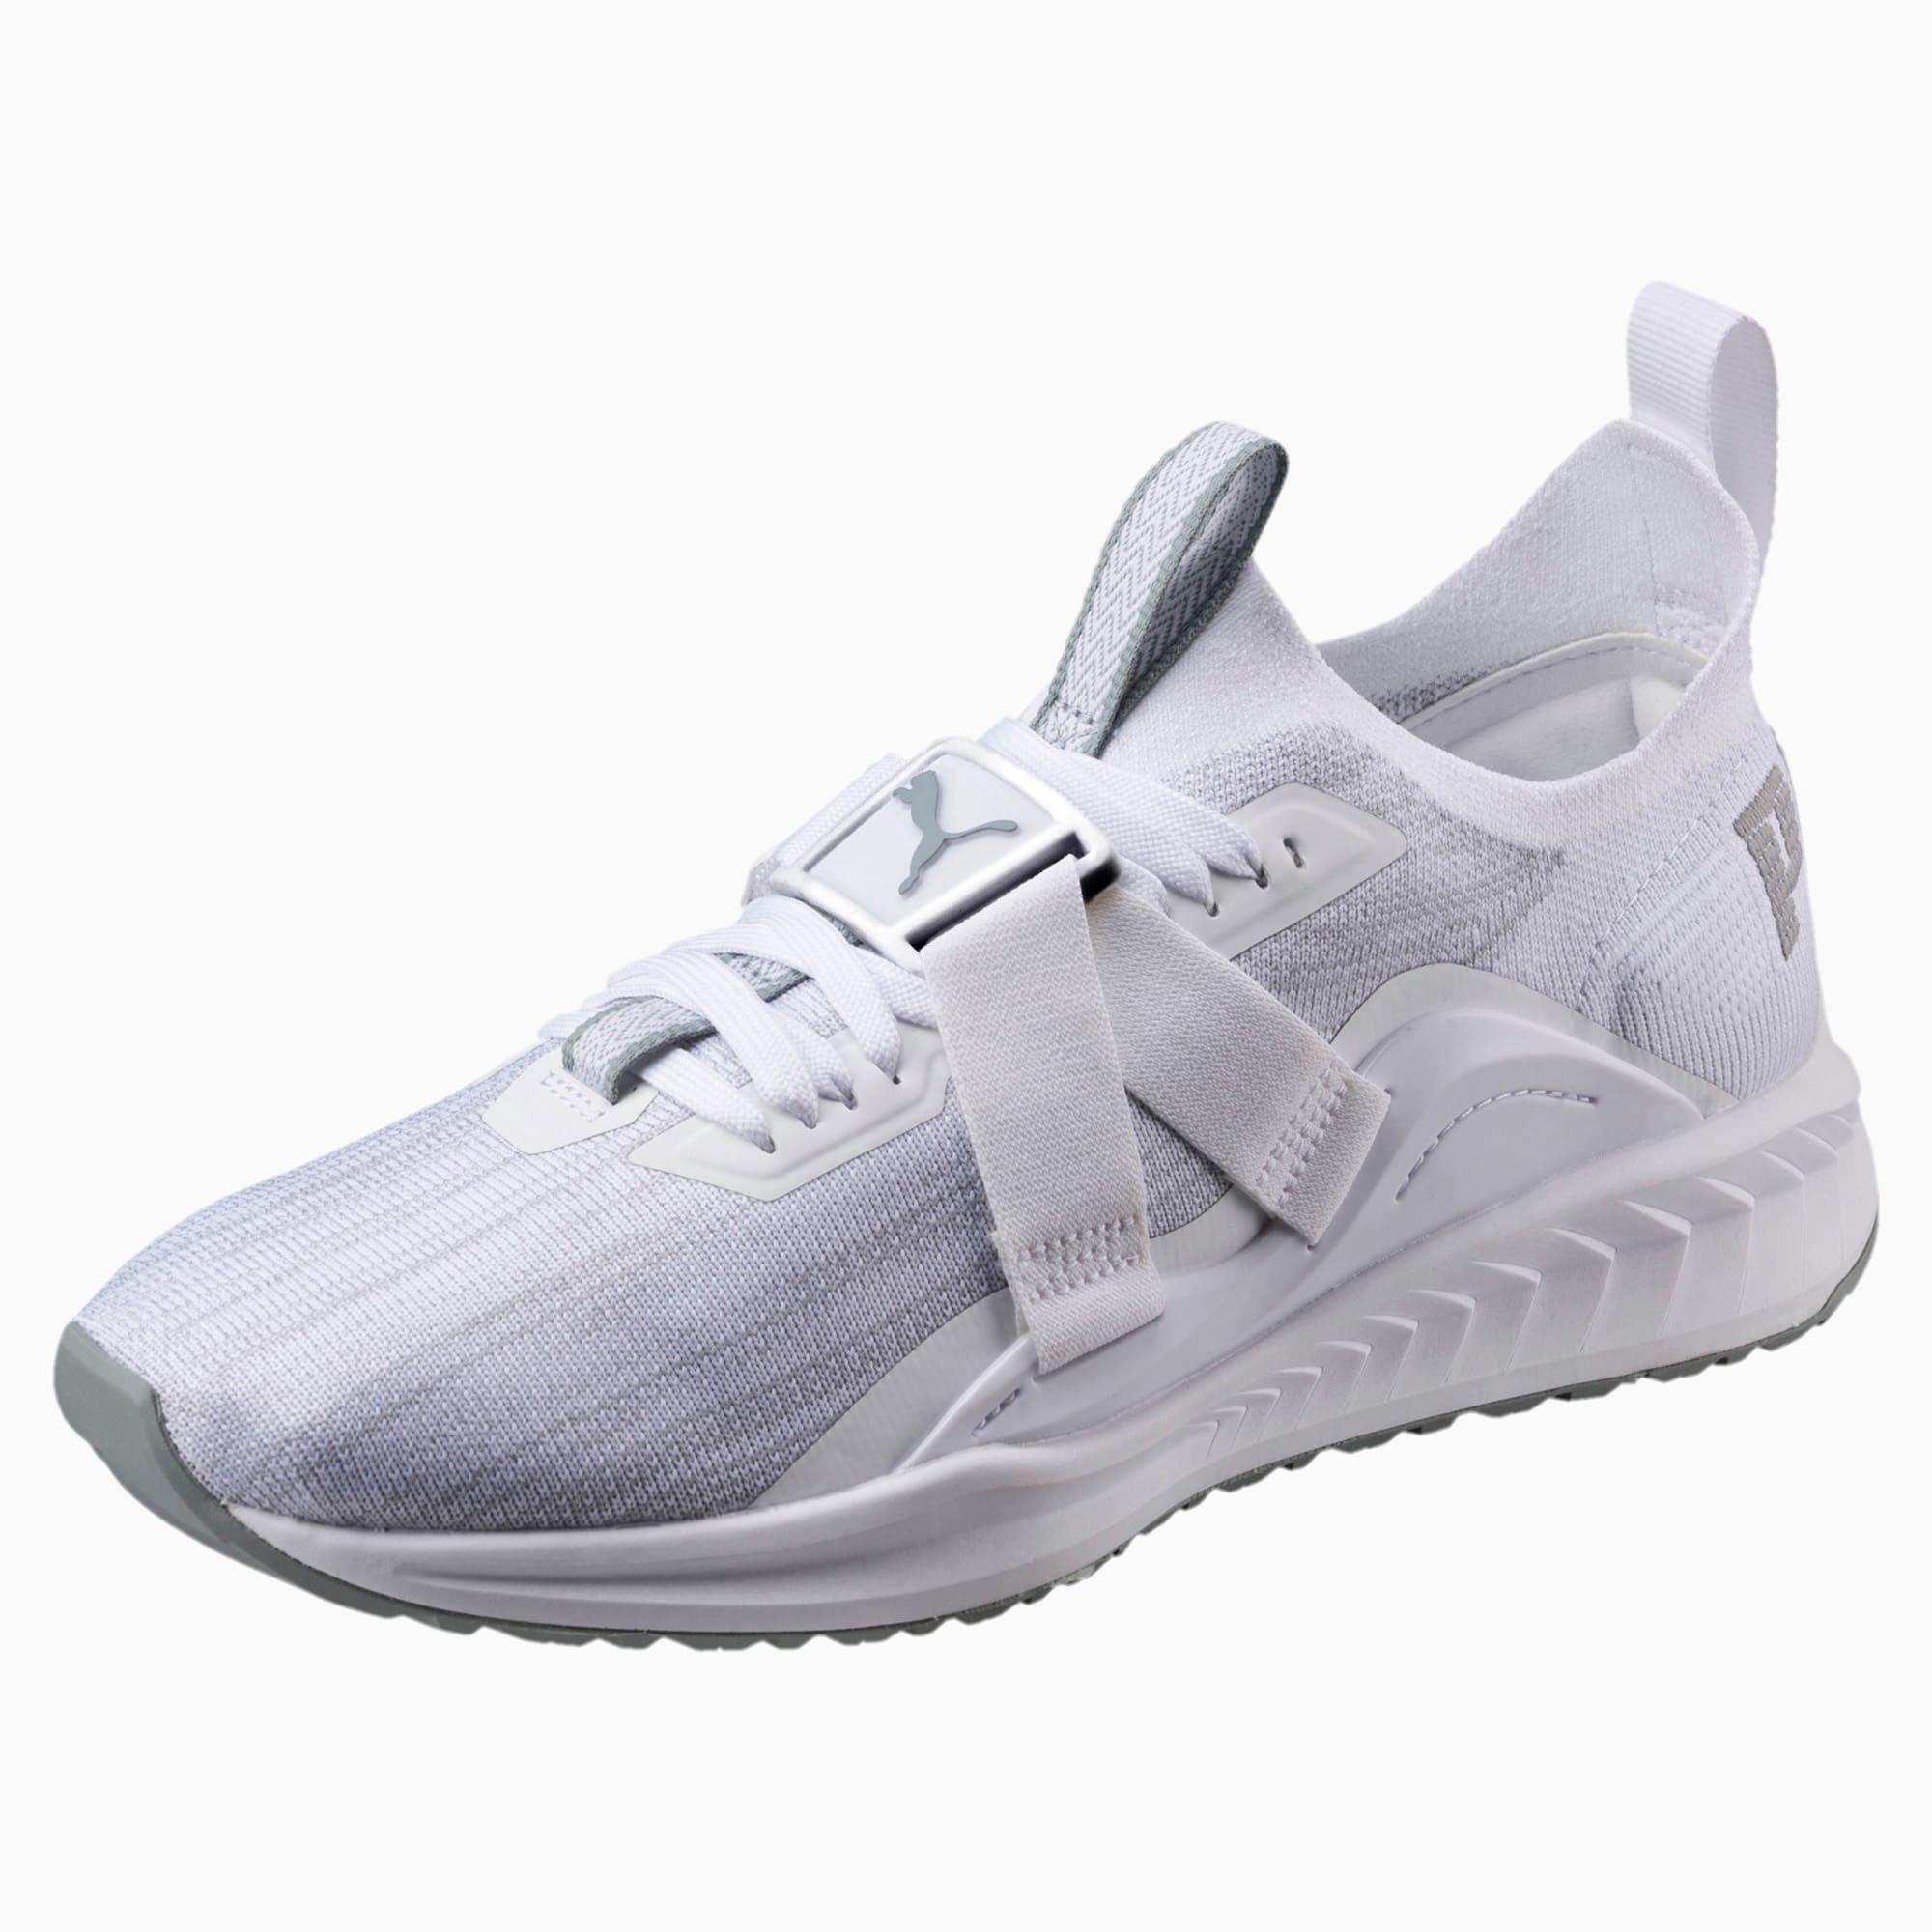 chaussure puma ignite evoknit